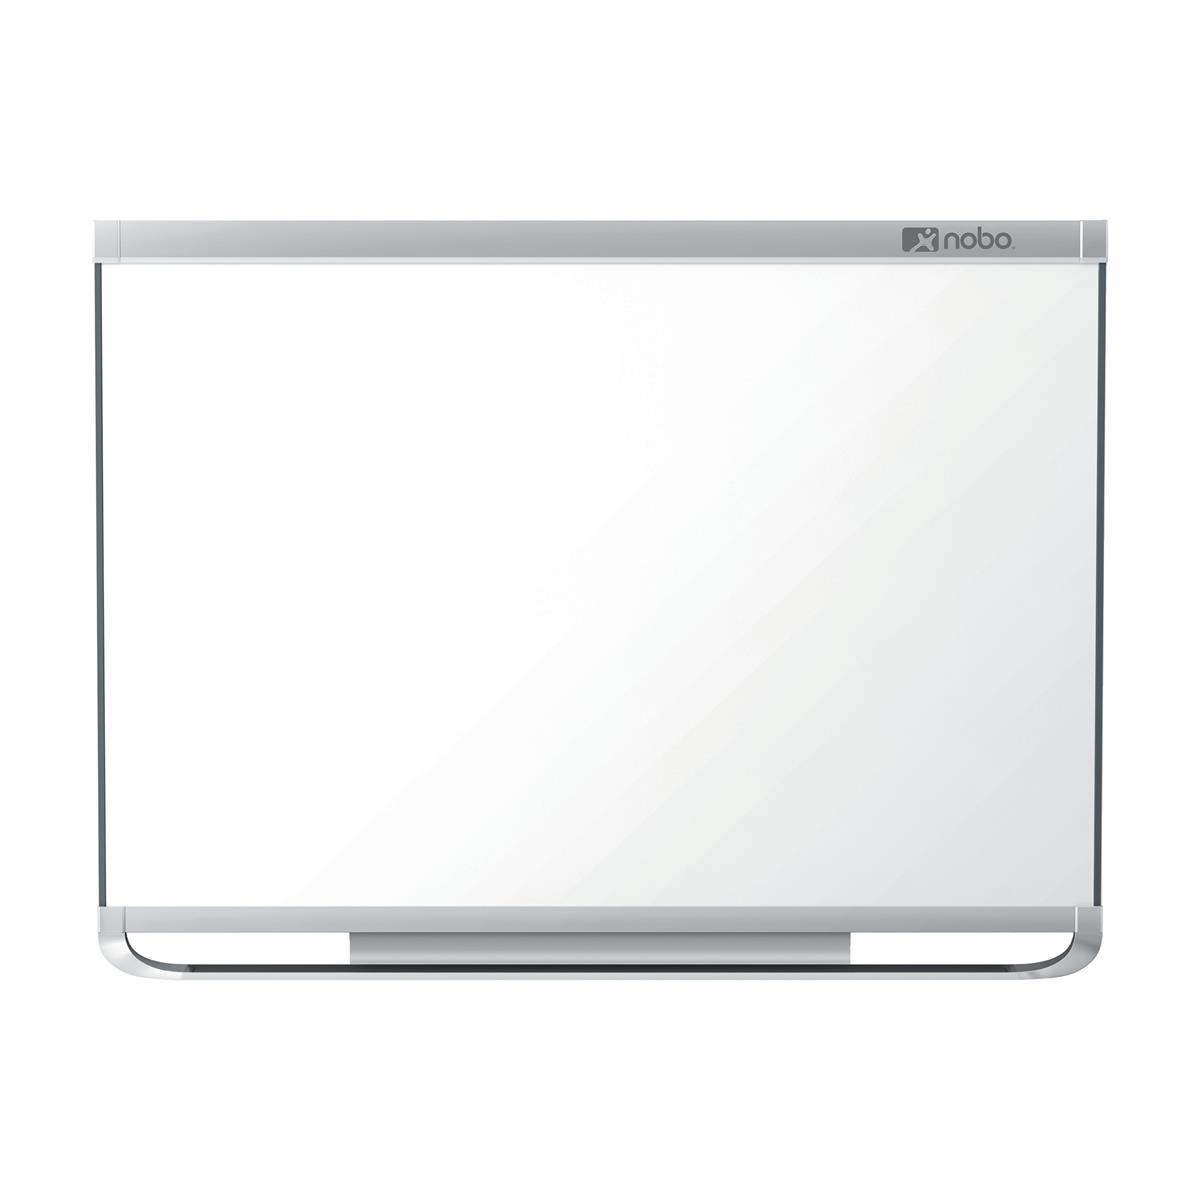 Nobo Prestige Enamel Whiteboard Connex Magnetic Fixings Included W1800xH1200mm White Ref 1902676